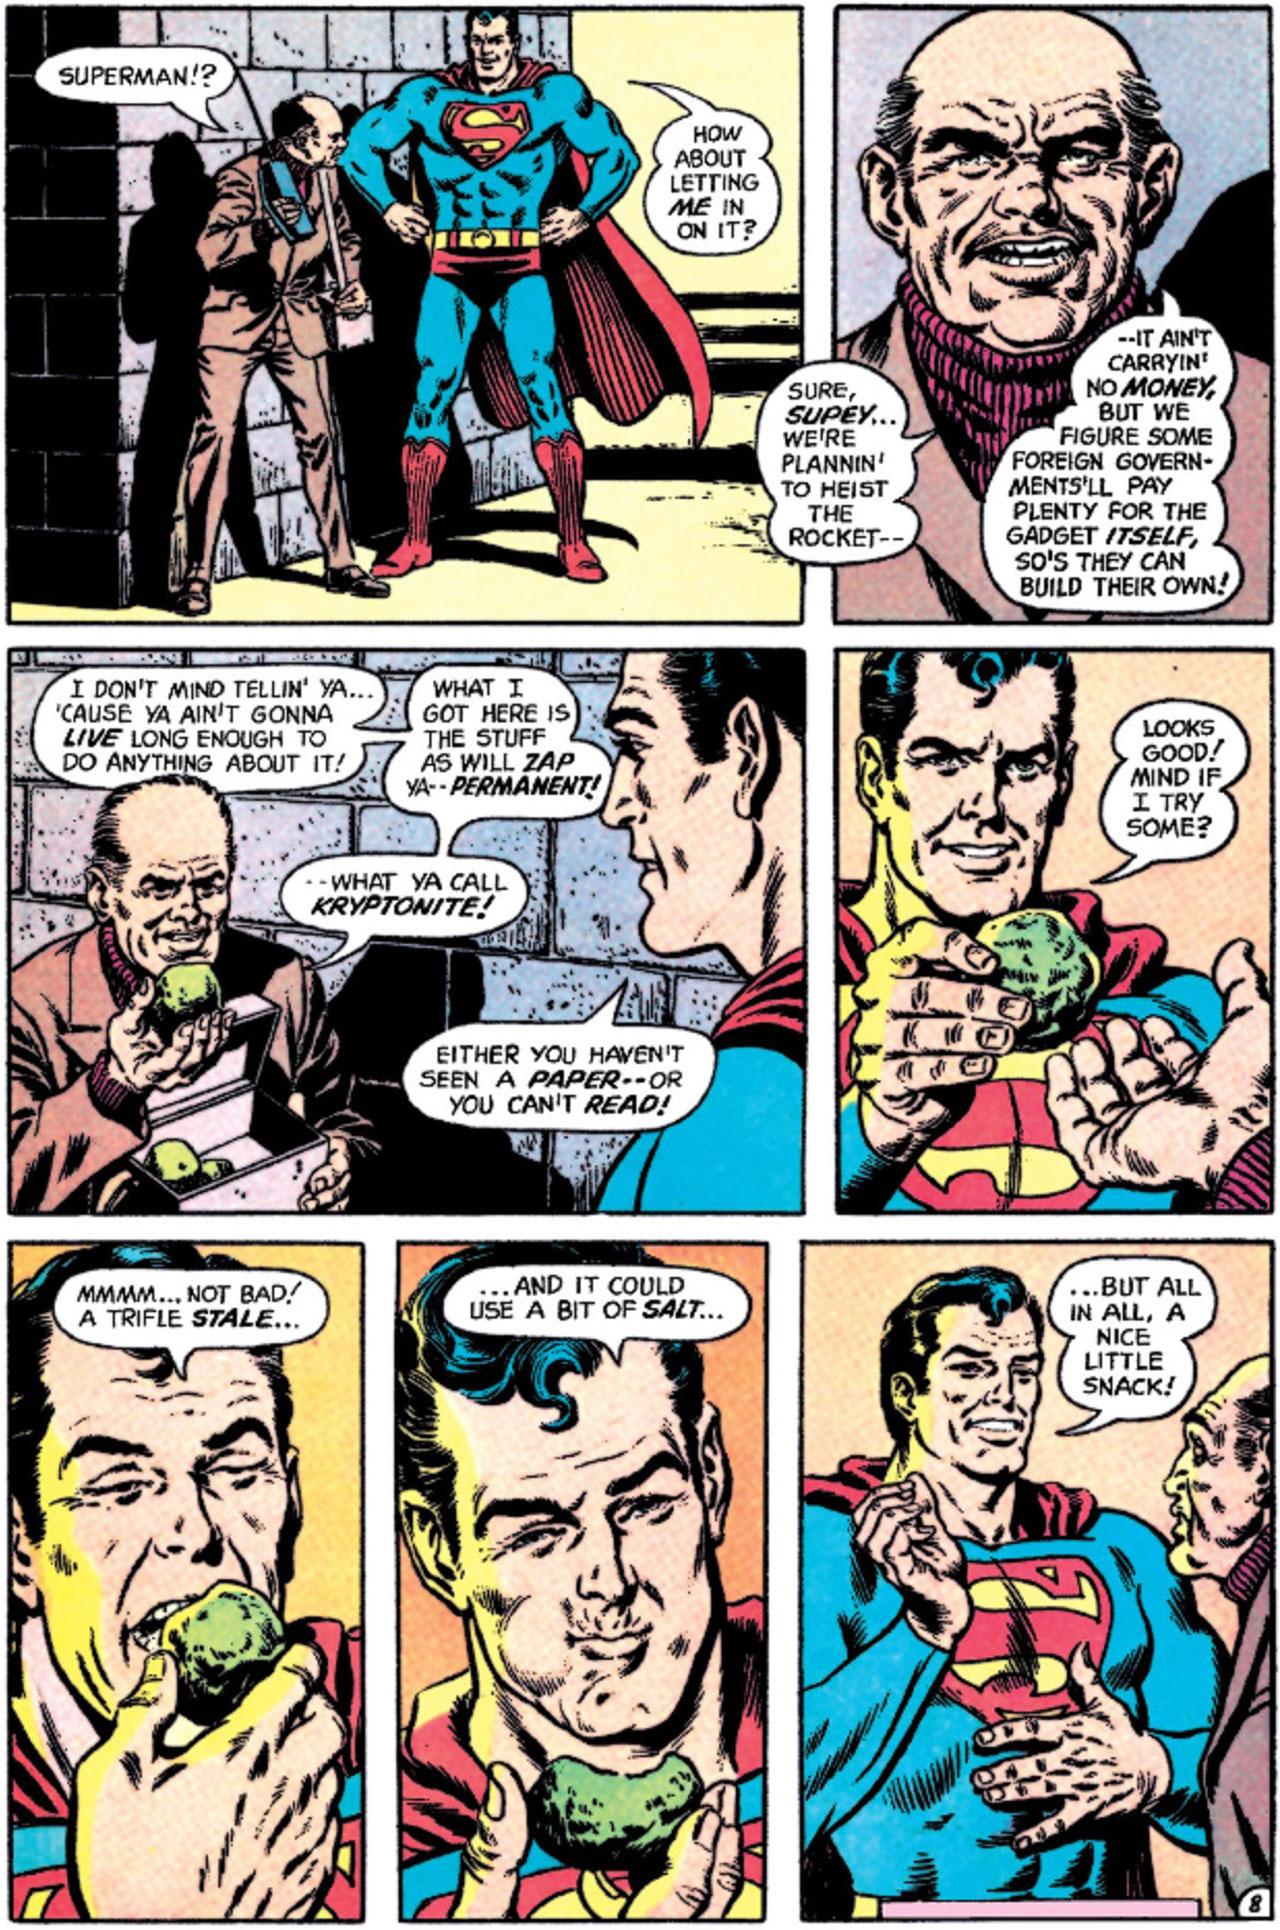 Superman-2.jpg